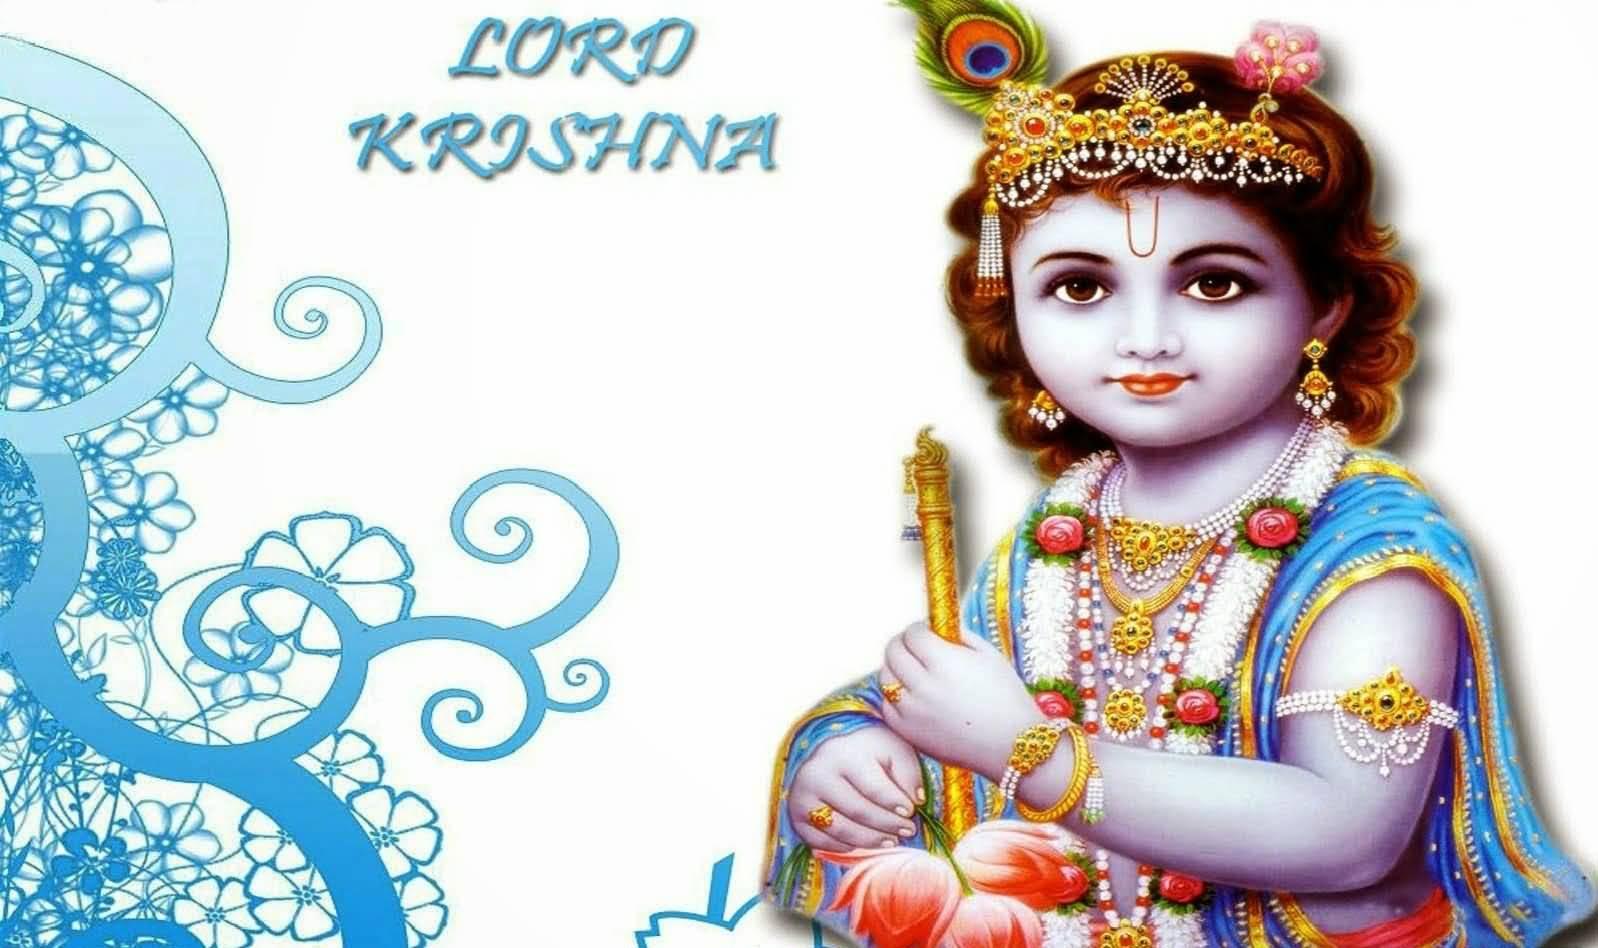 Lord Krishna Janmashtami Greetings Wallpaper Image